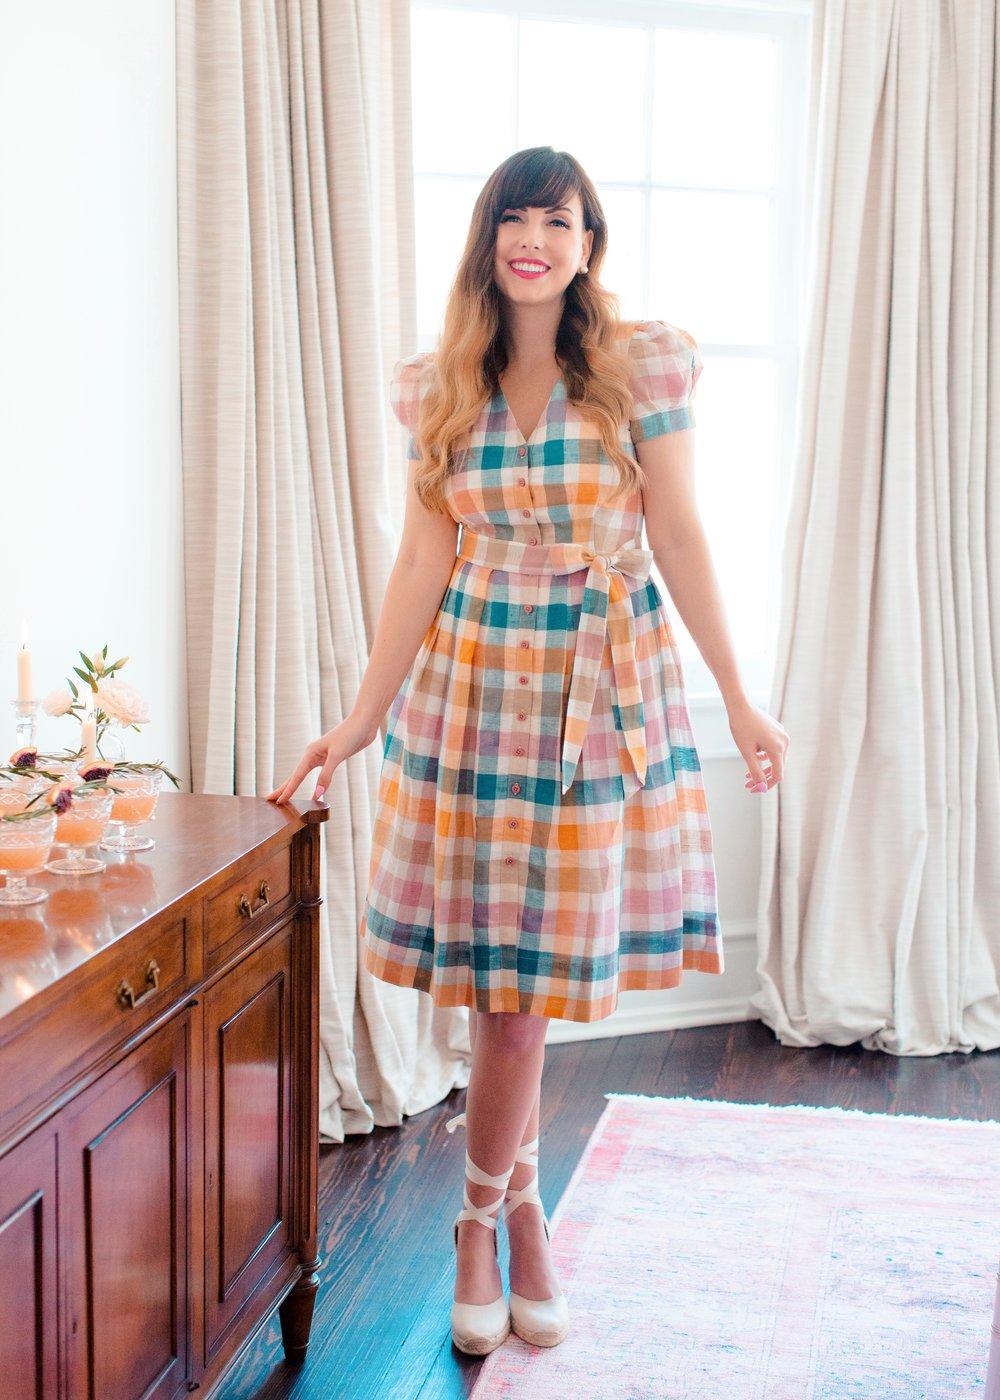 gmg colorful gingham charming dress.jpg